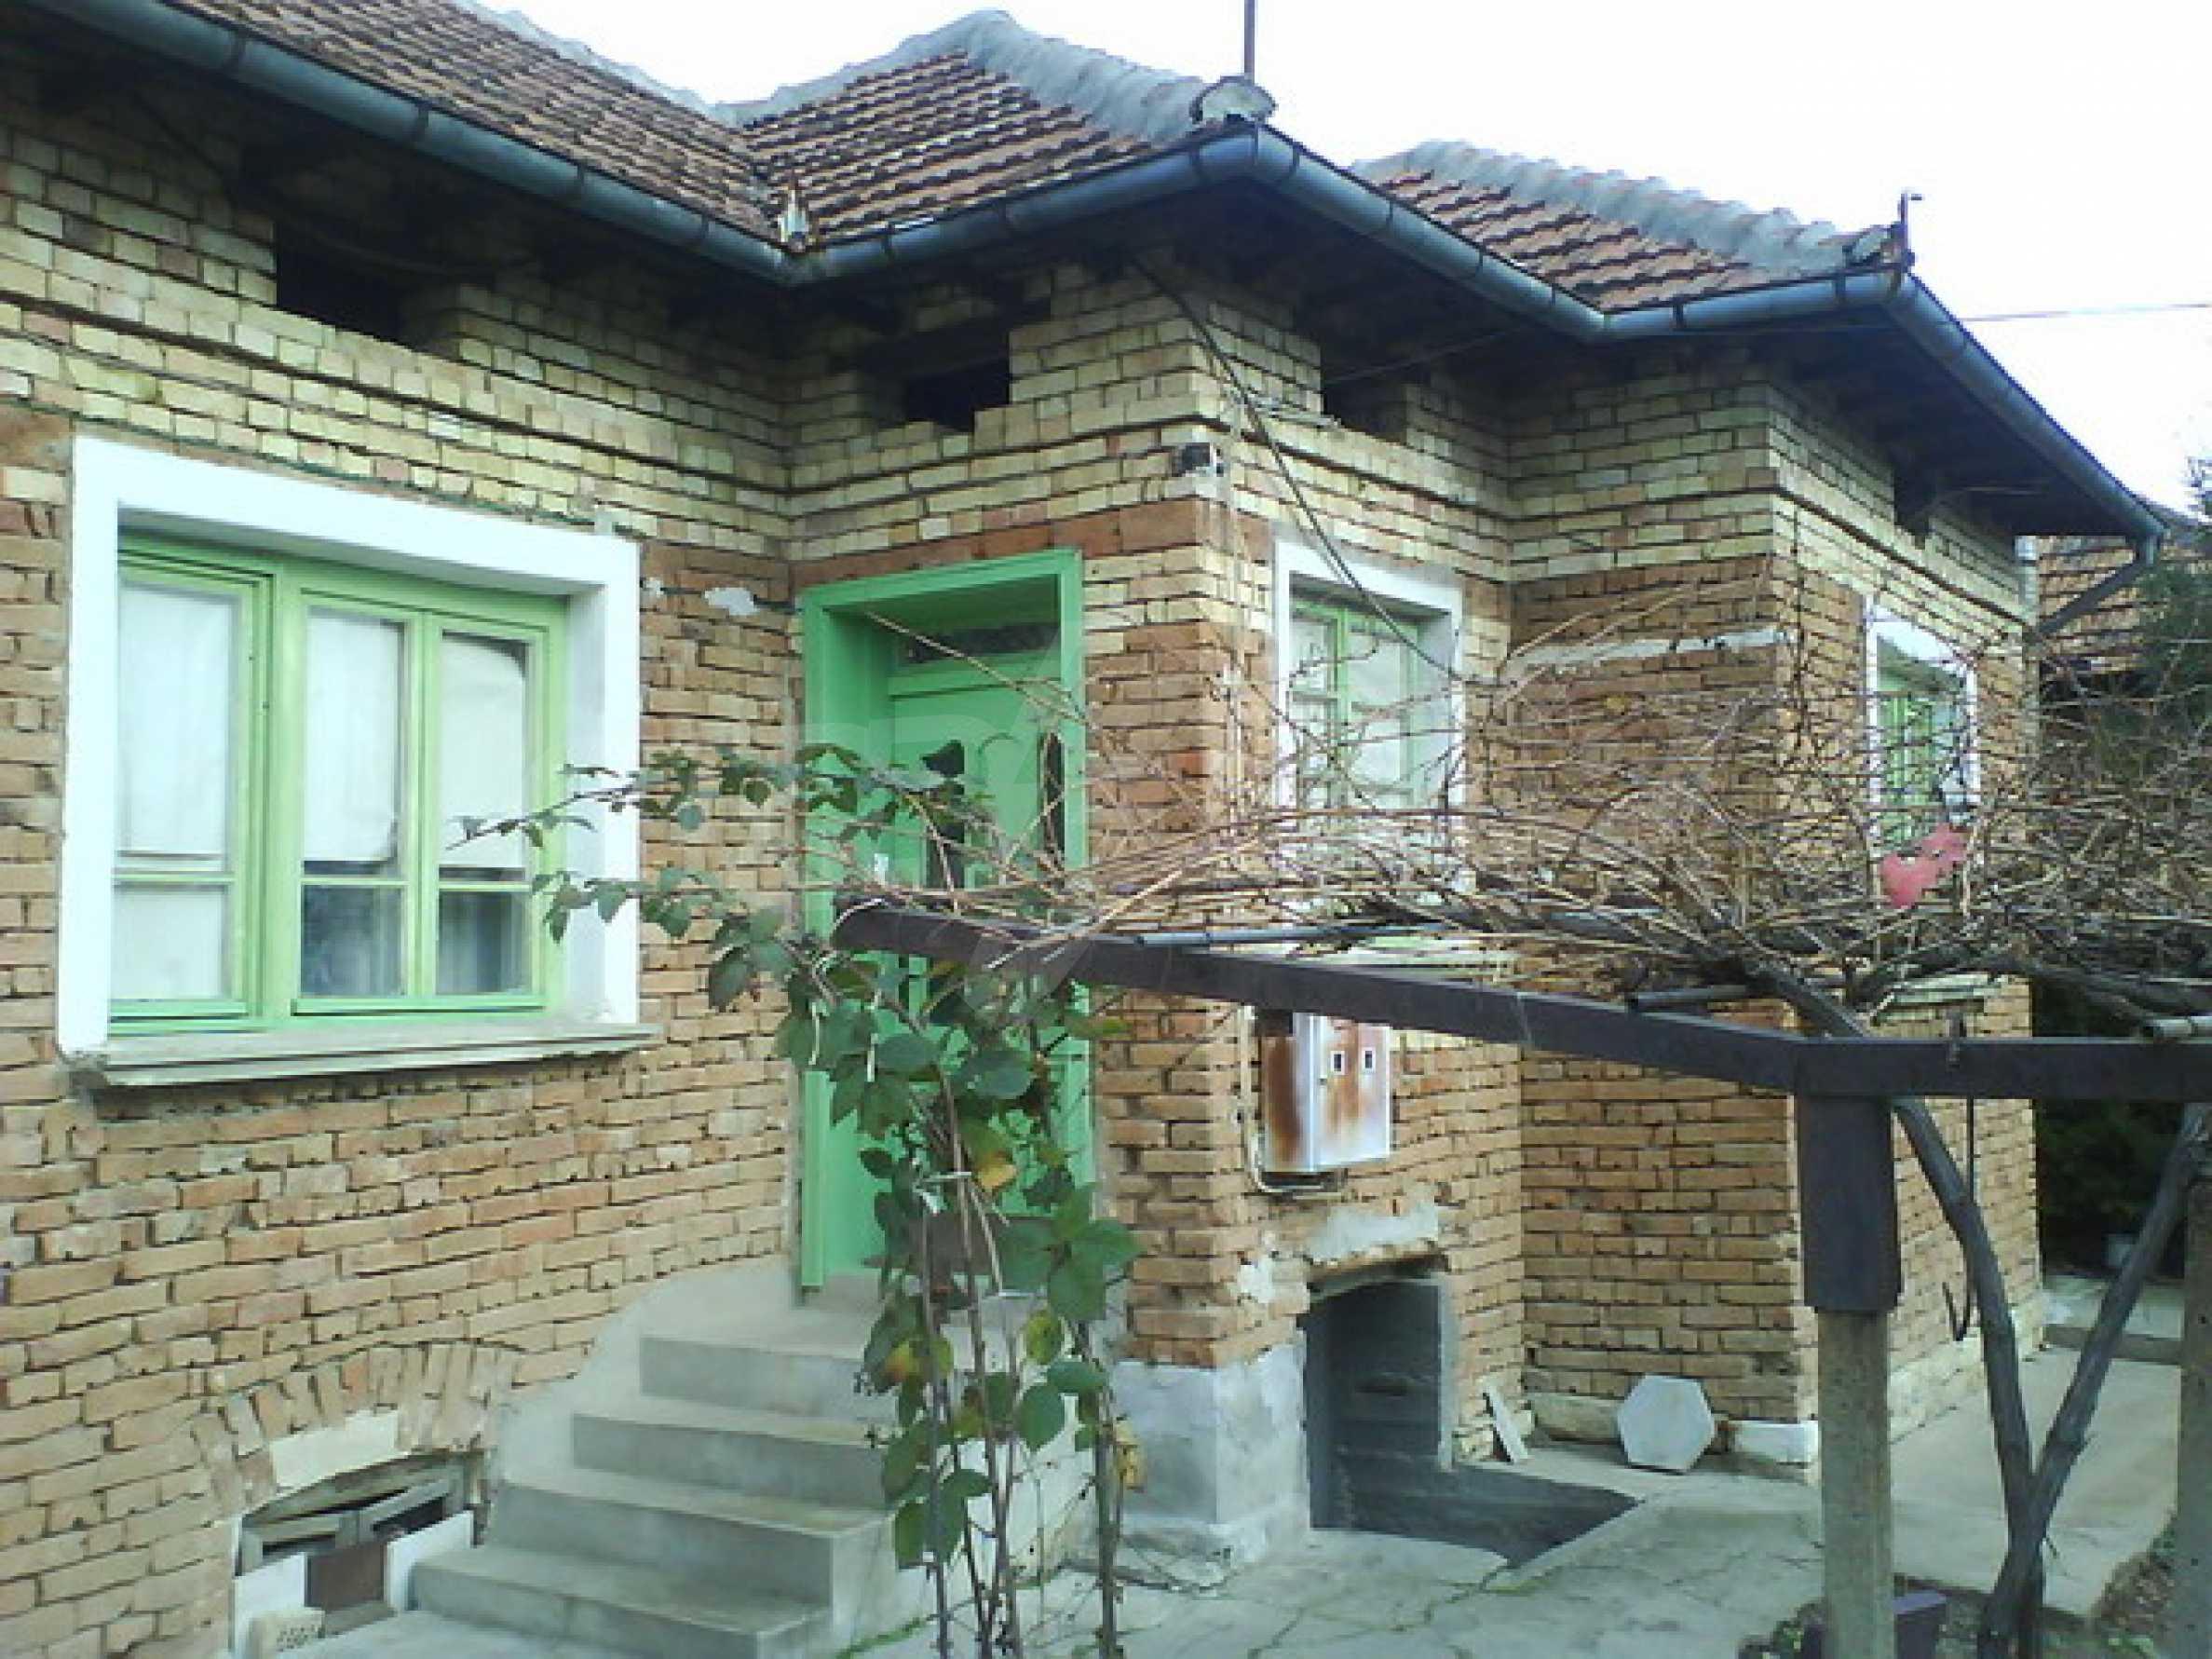 Brick built house